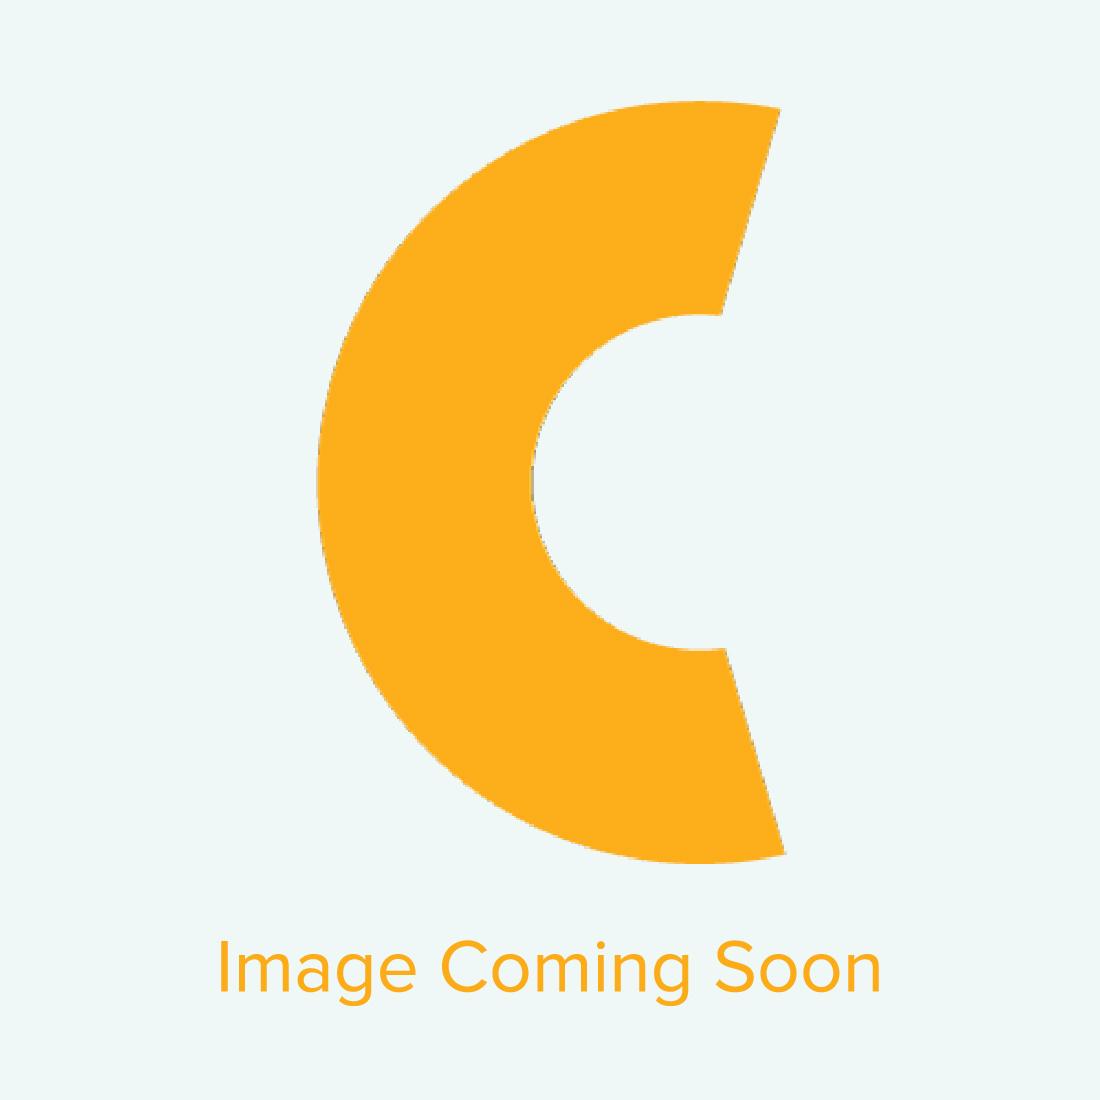 "Double Sided Creative Border Clipboard with Flat Clip - Monaco Design - 9.76"" x 12.68"" (12/case)"